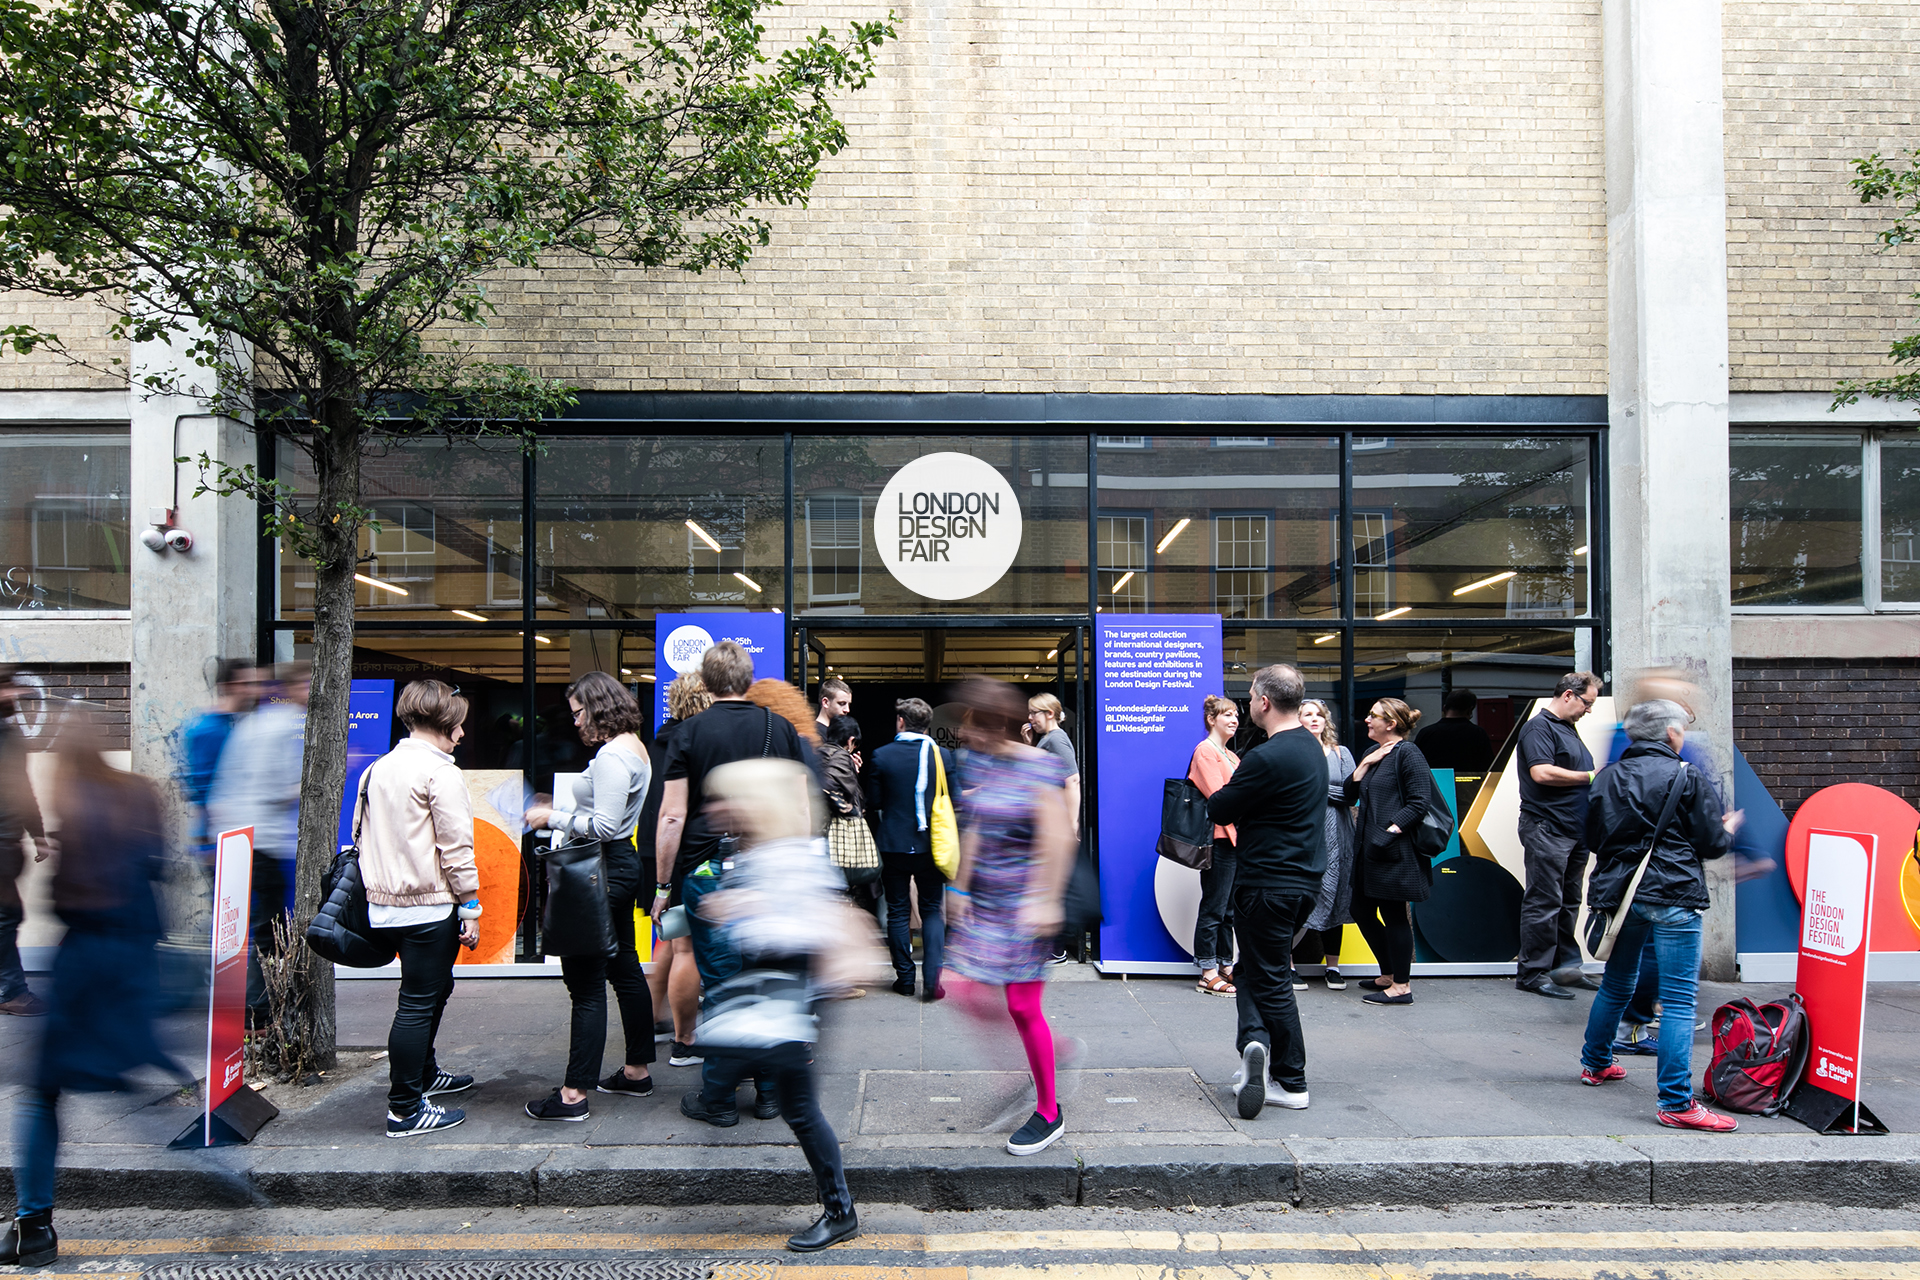 design week,design events, design, design agenda, september 2018, design paris, design london, design venice, maison et objet design events Design Monthly: The Best Design Events in September 2018 london design fair 2018